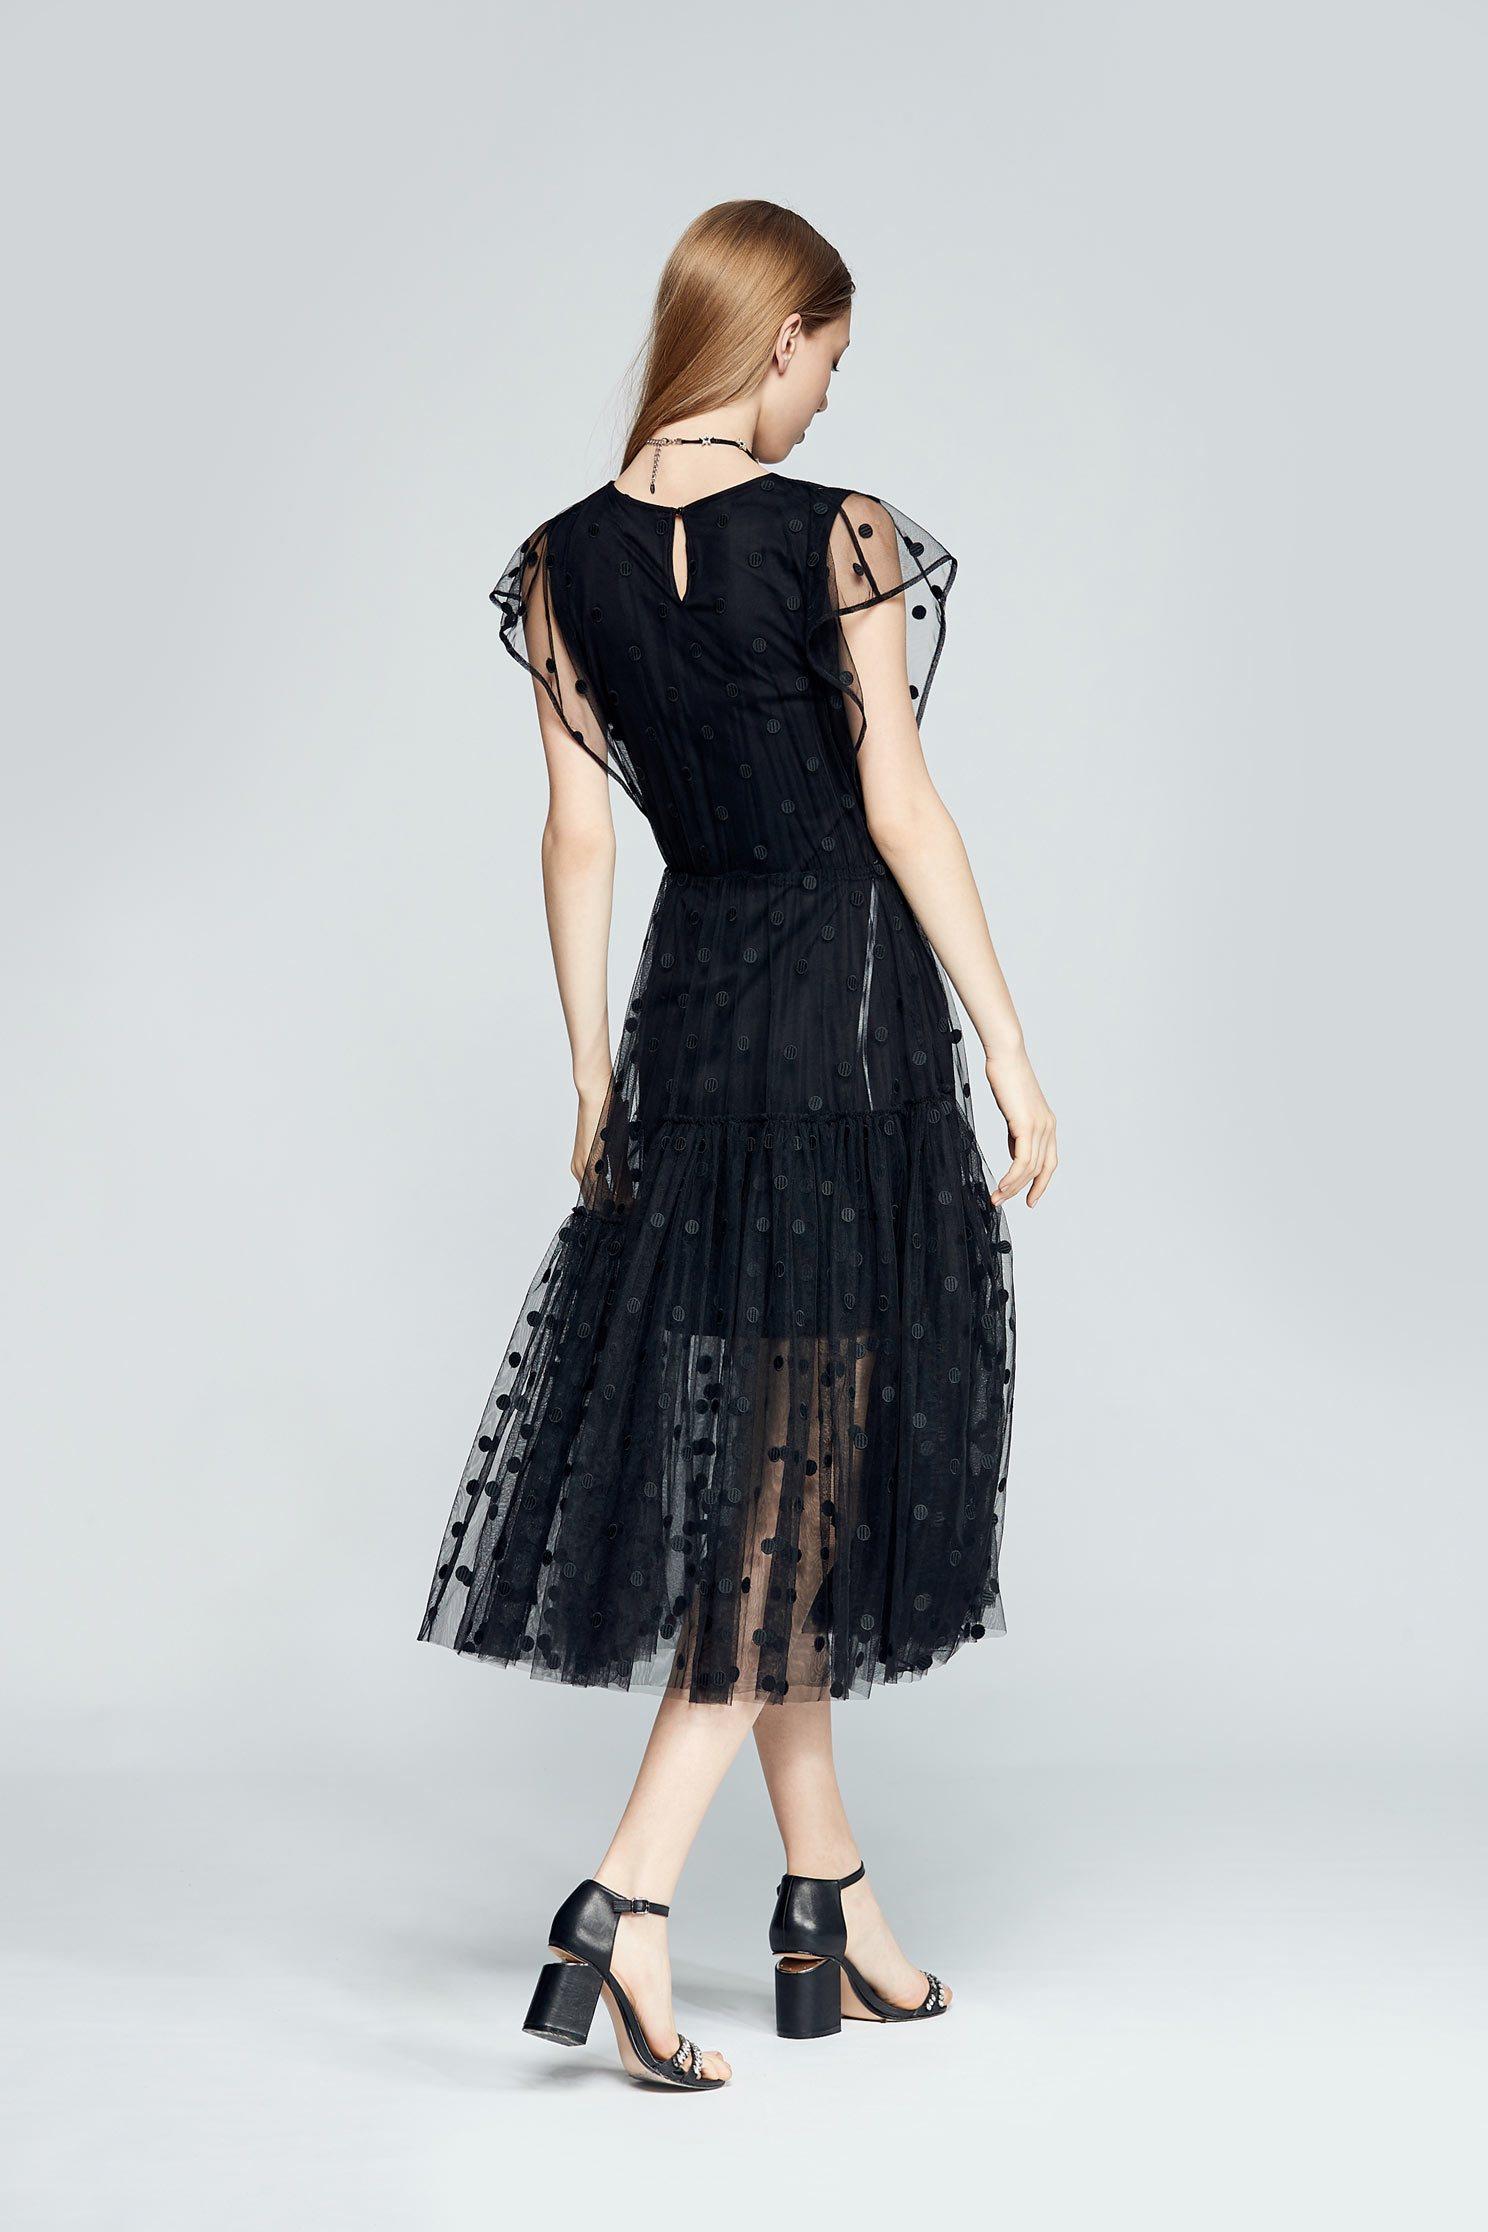 Poka dot design dress,sleevelessdress,cotton,perspectivedress,blackdress